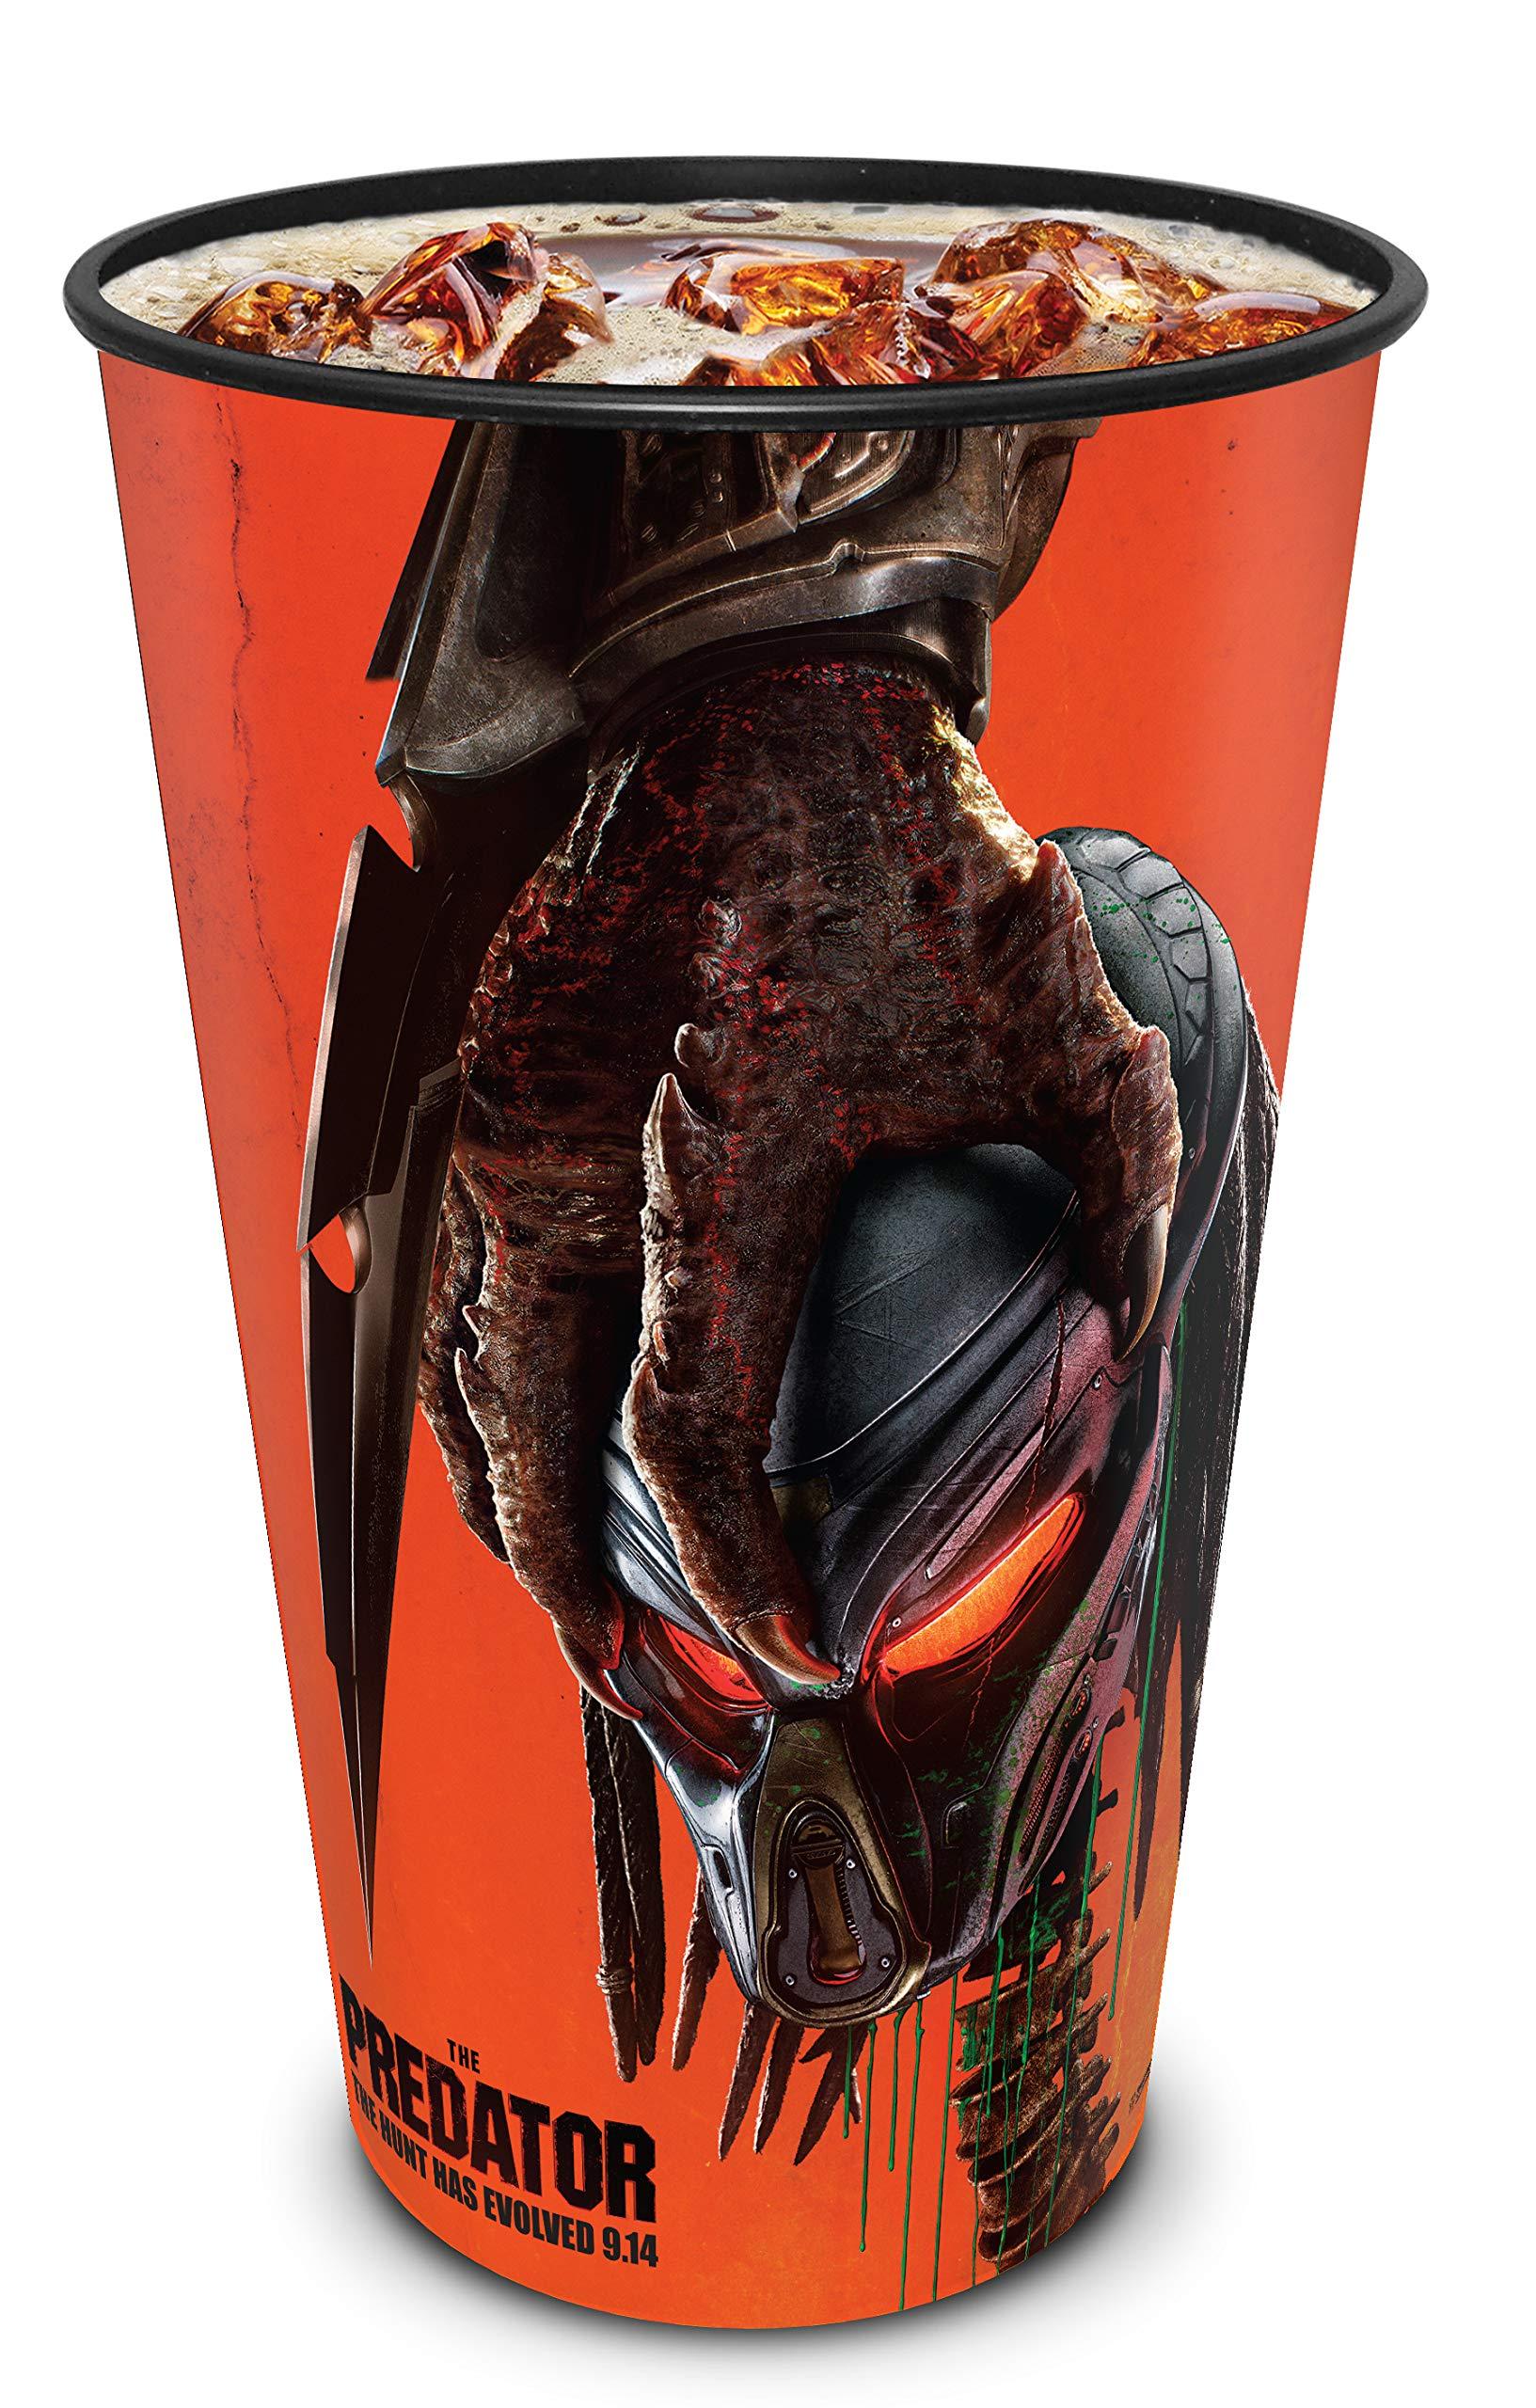 Predator 2018 Movie Theater Exclusive 170/44 oz Family Pack